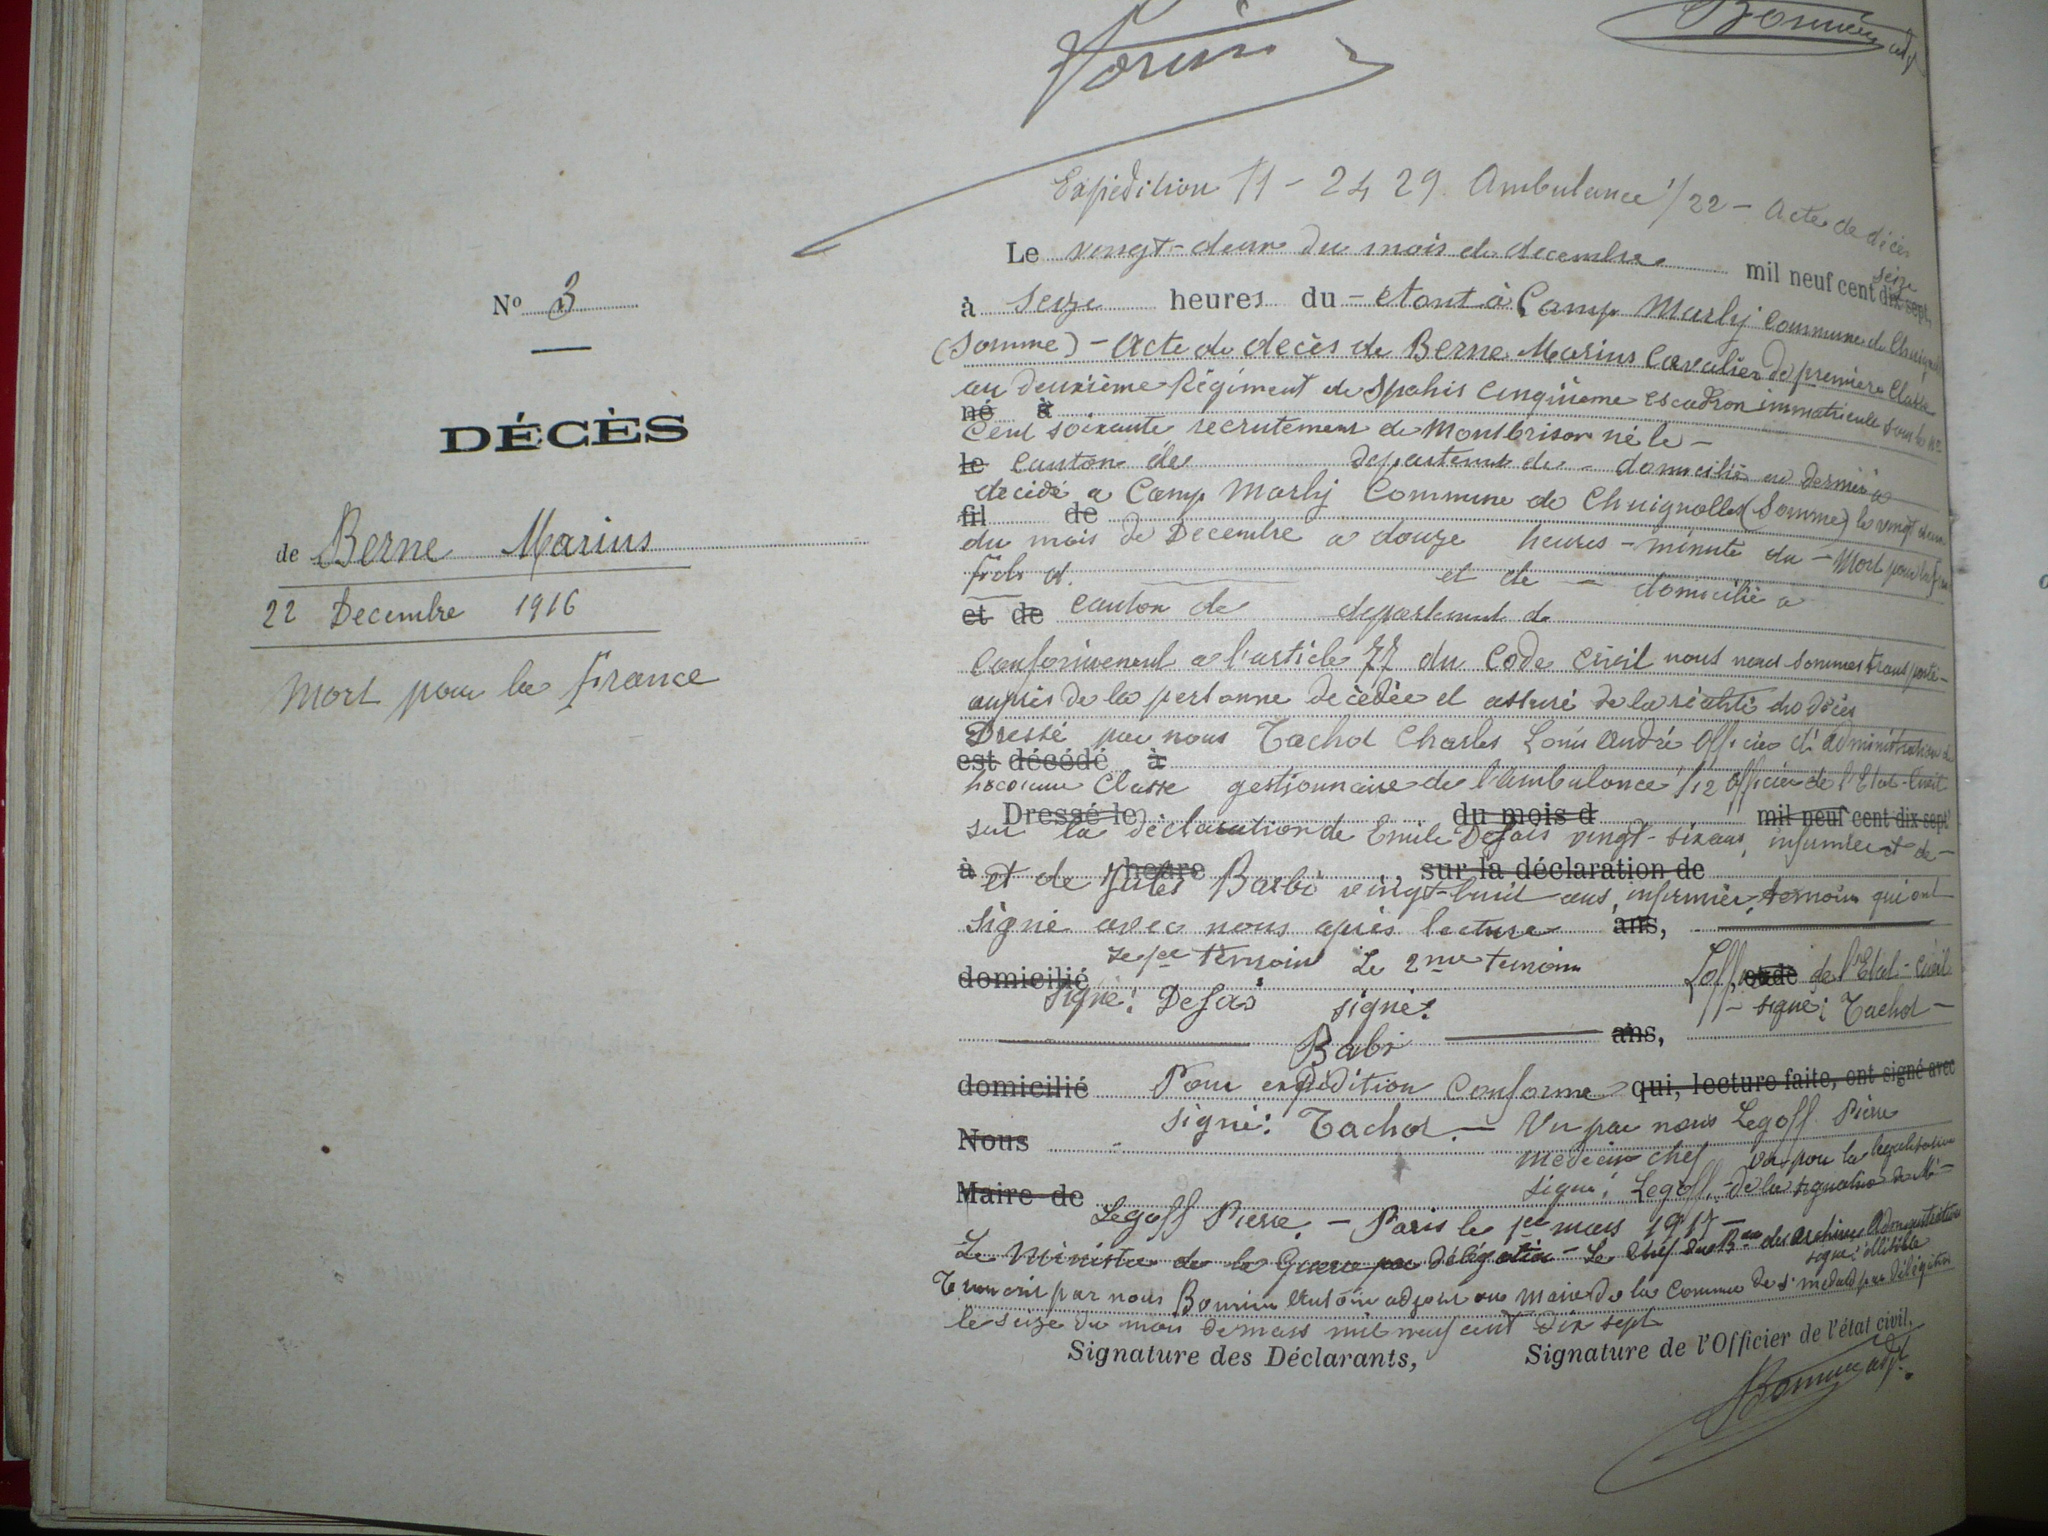 Marius-Berne-22-12-1916.JPG